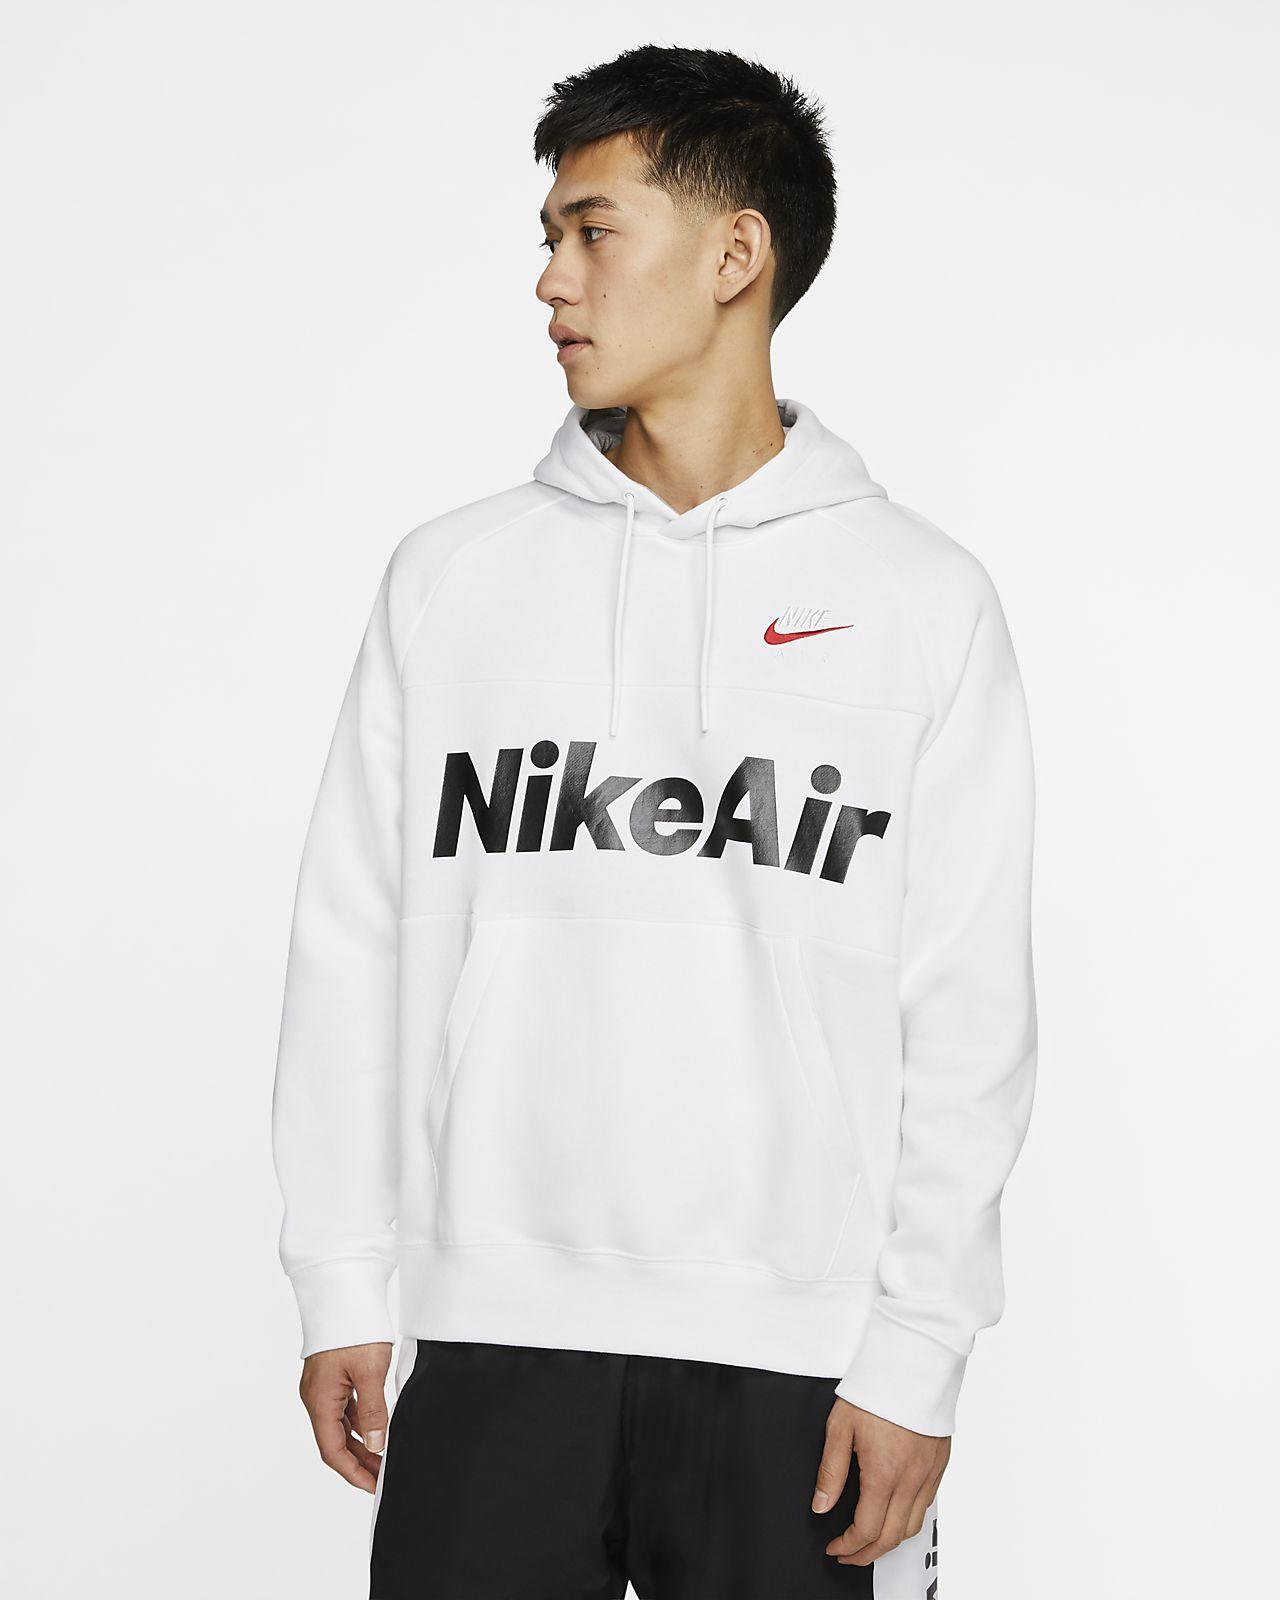 Nike Air Fleece Hoodie für Herren